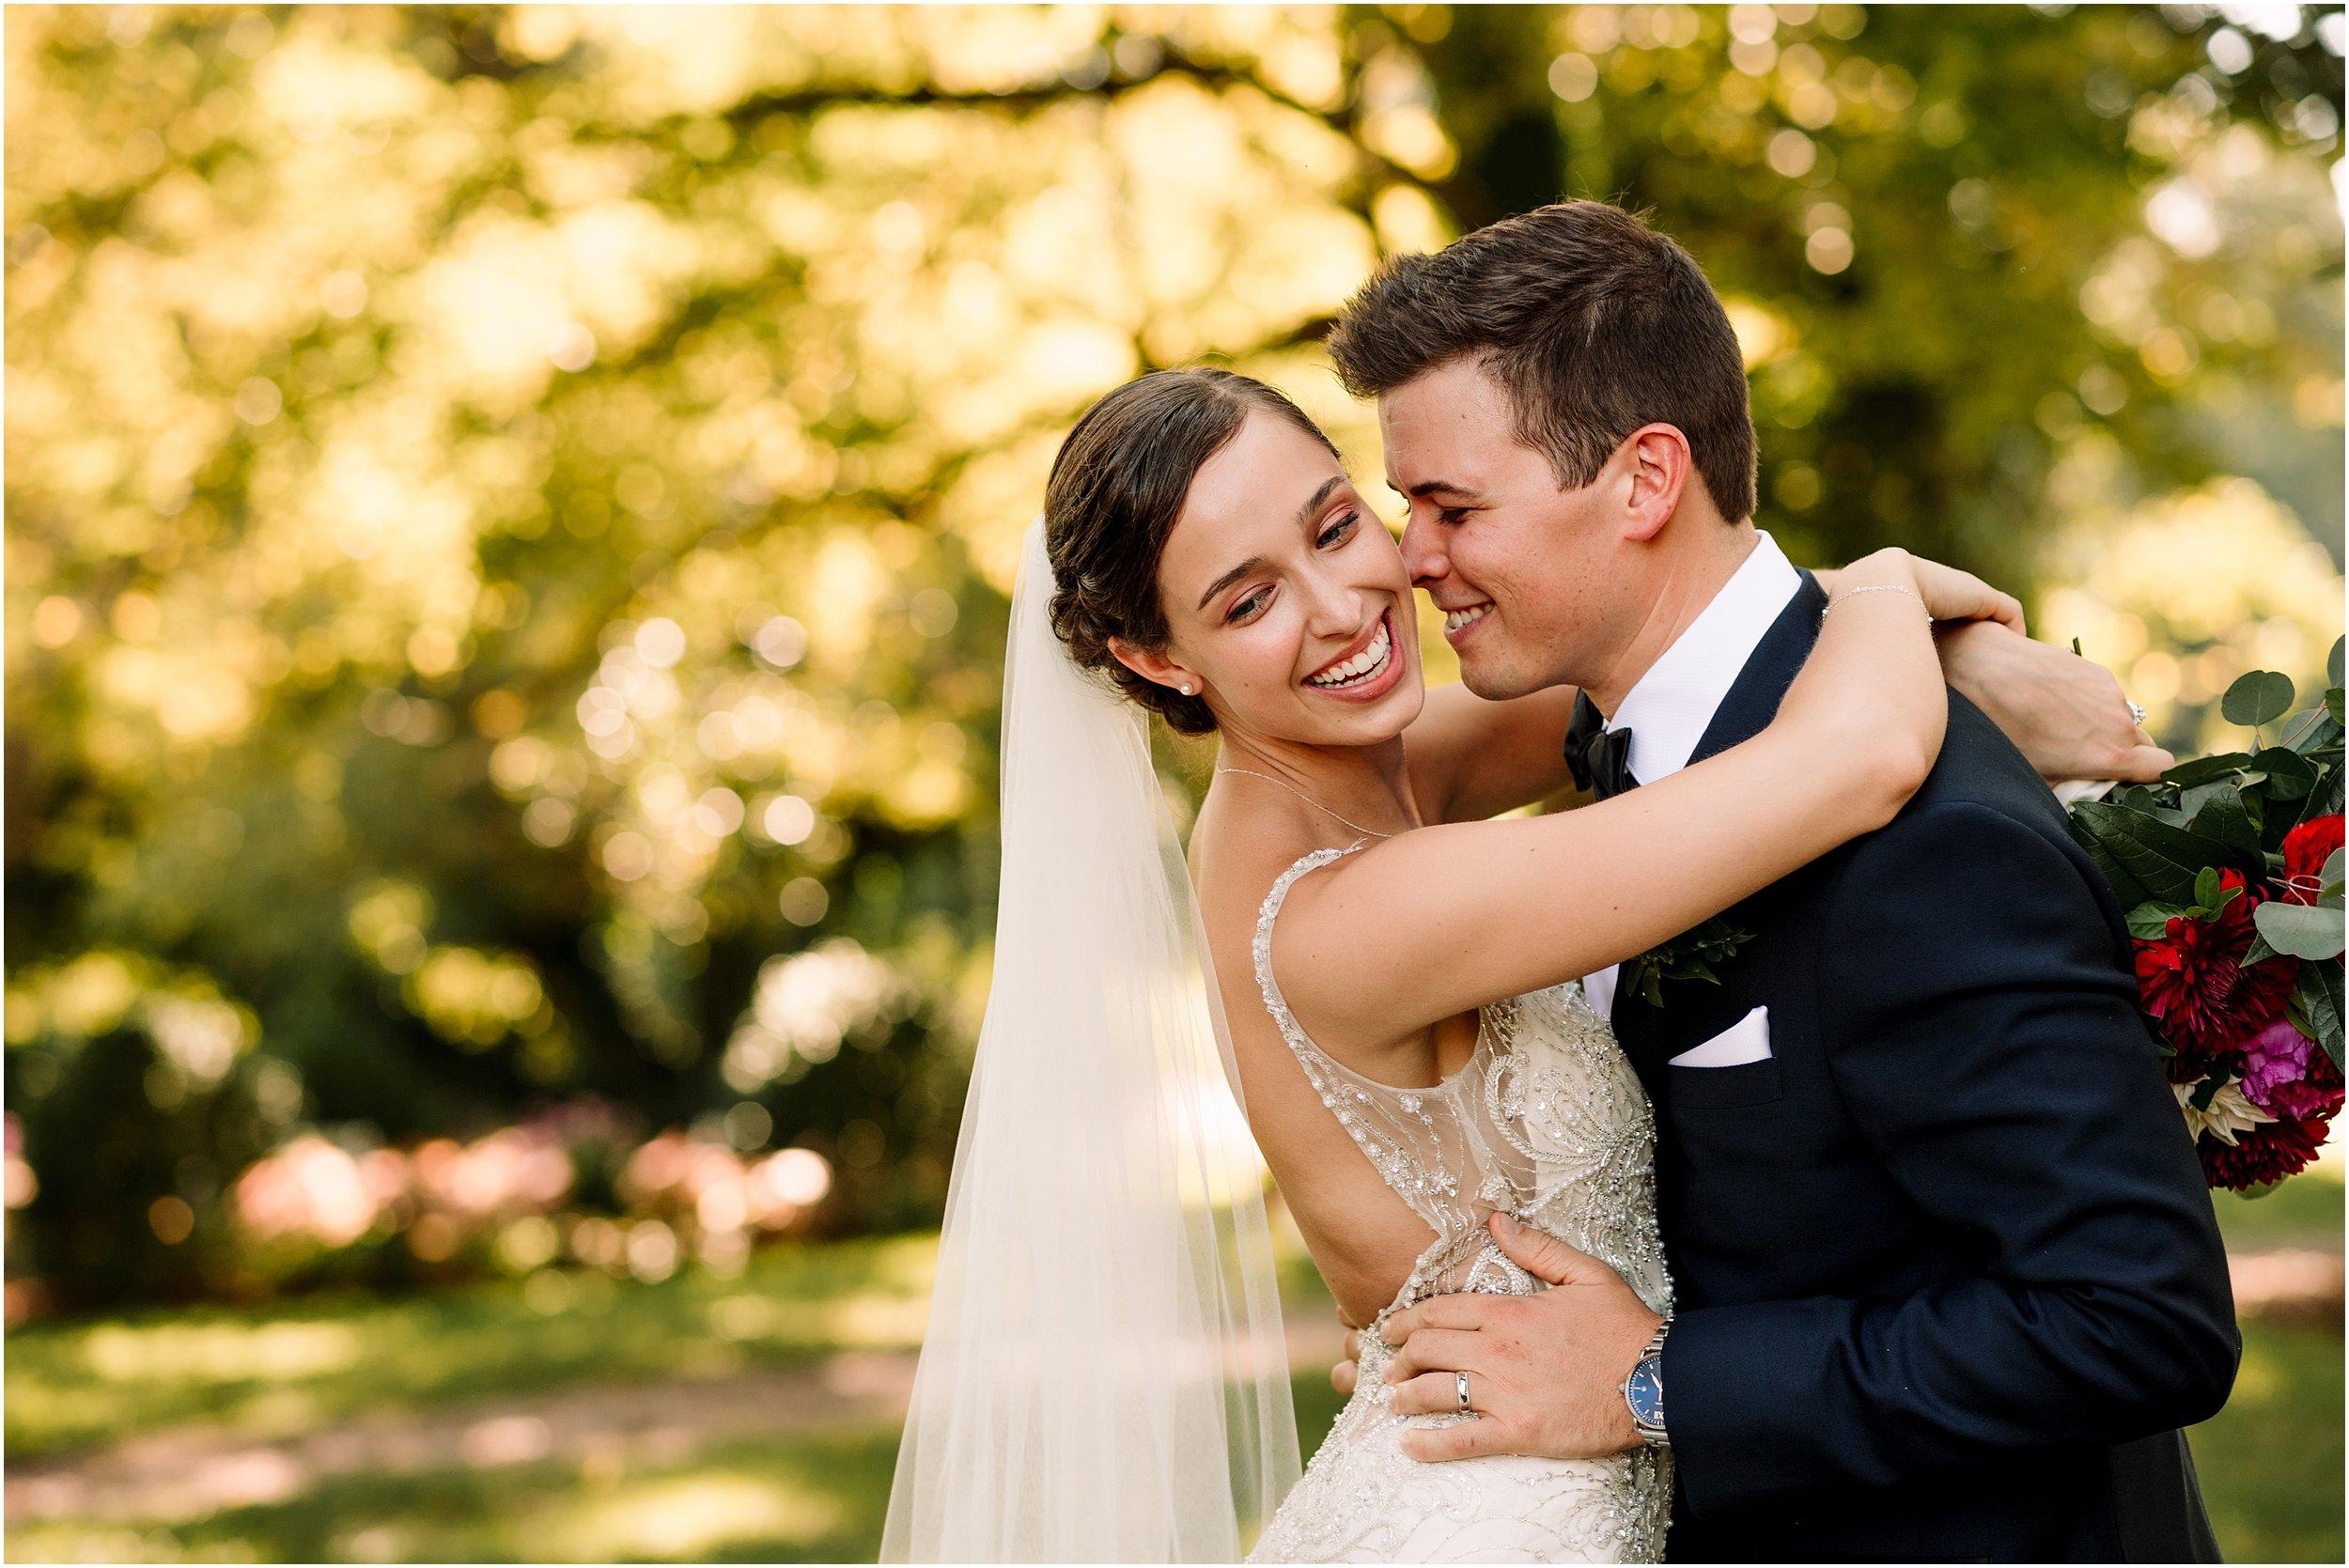 hannah leigh photography Antrim 1844 Wedding_1227.jpg